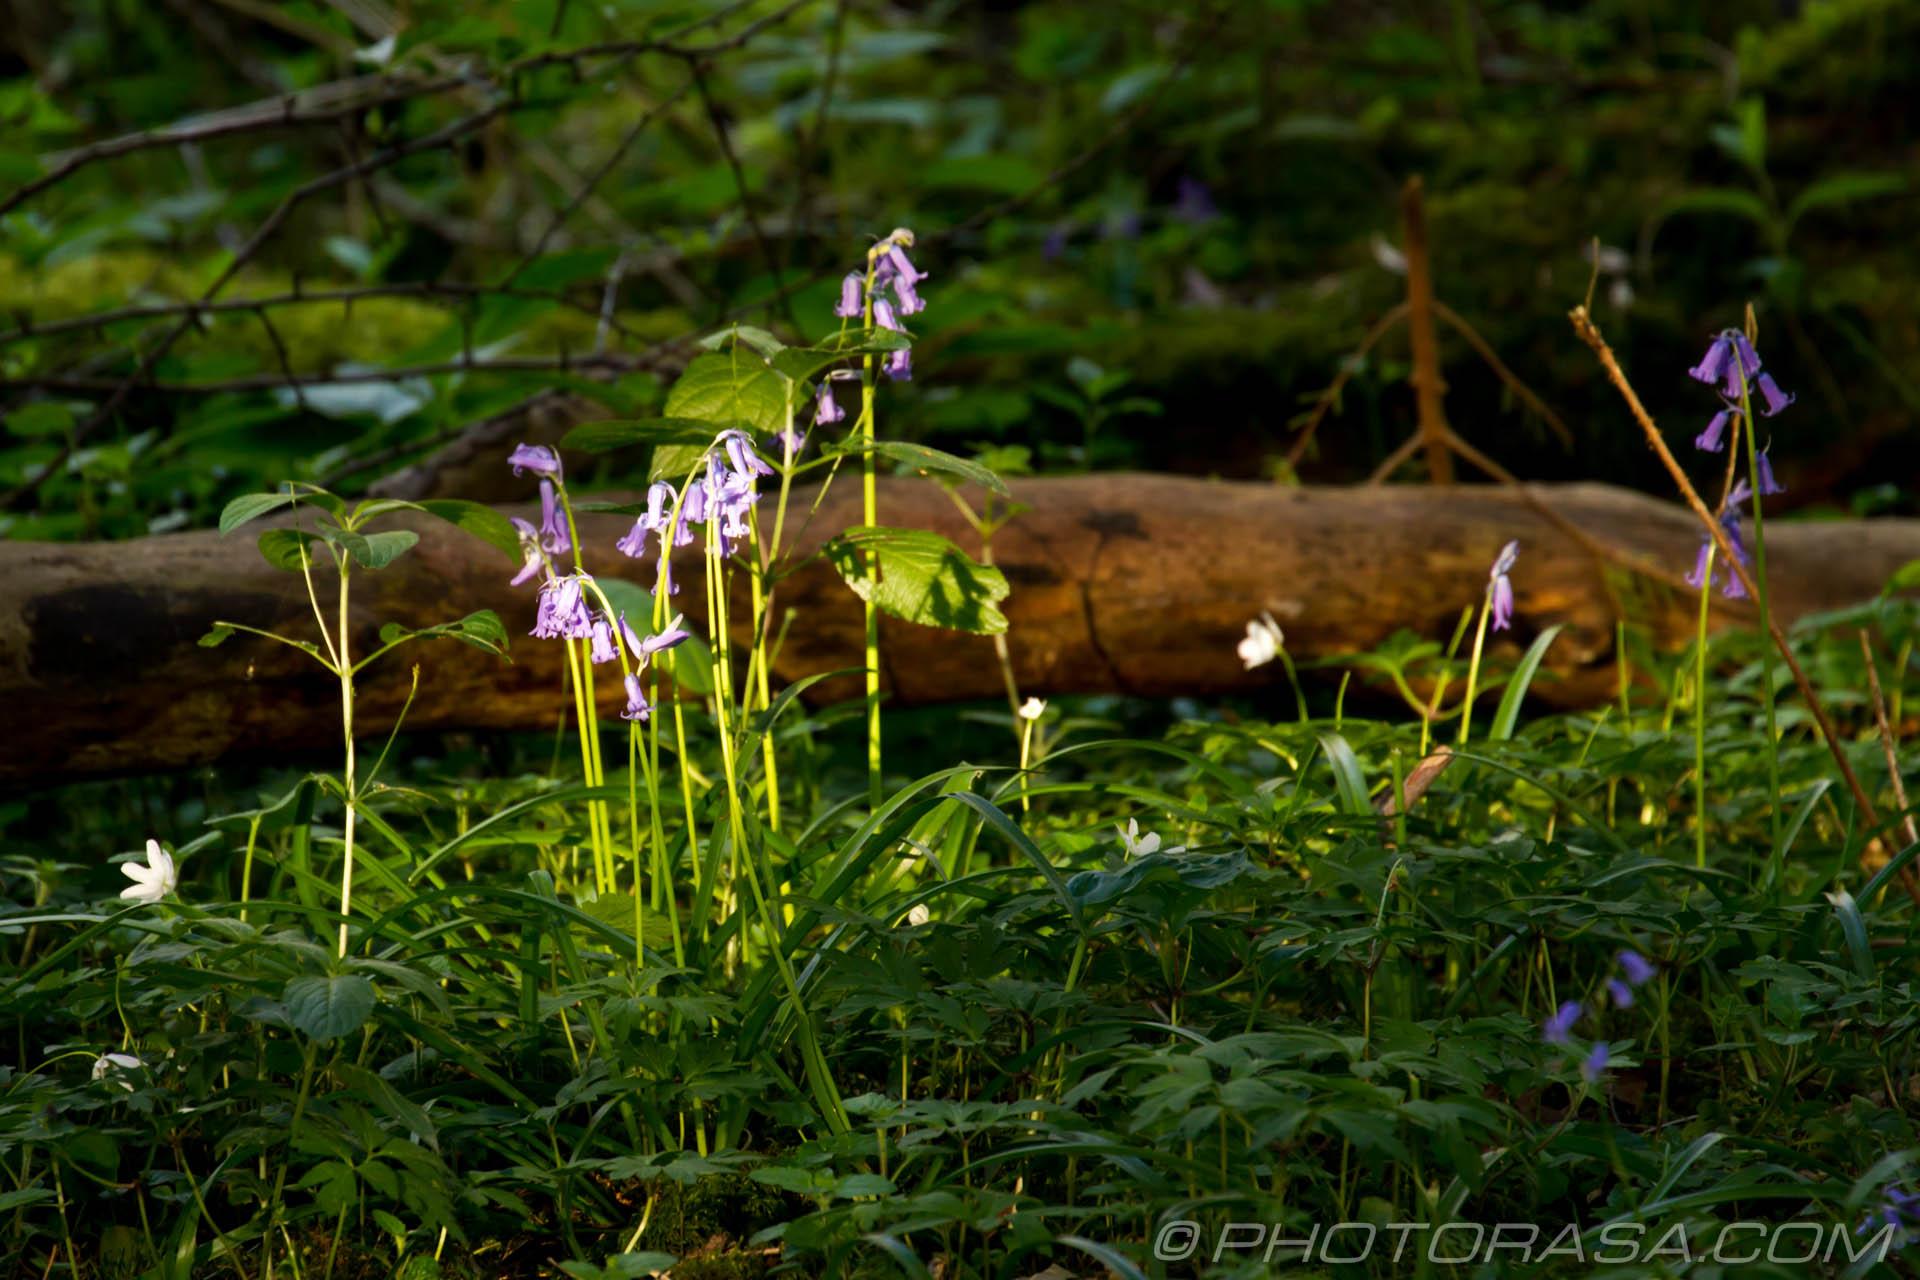 https://photorasa.com/bluebells-woods/sunlit-bluebells/